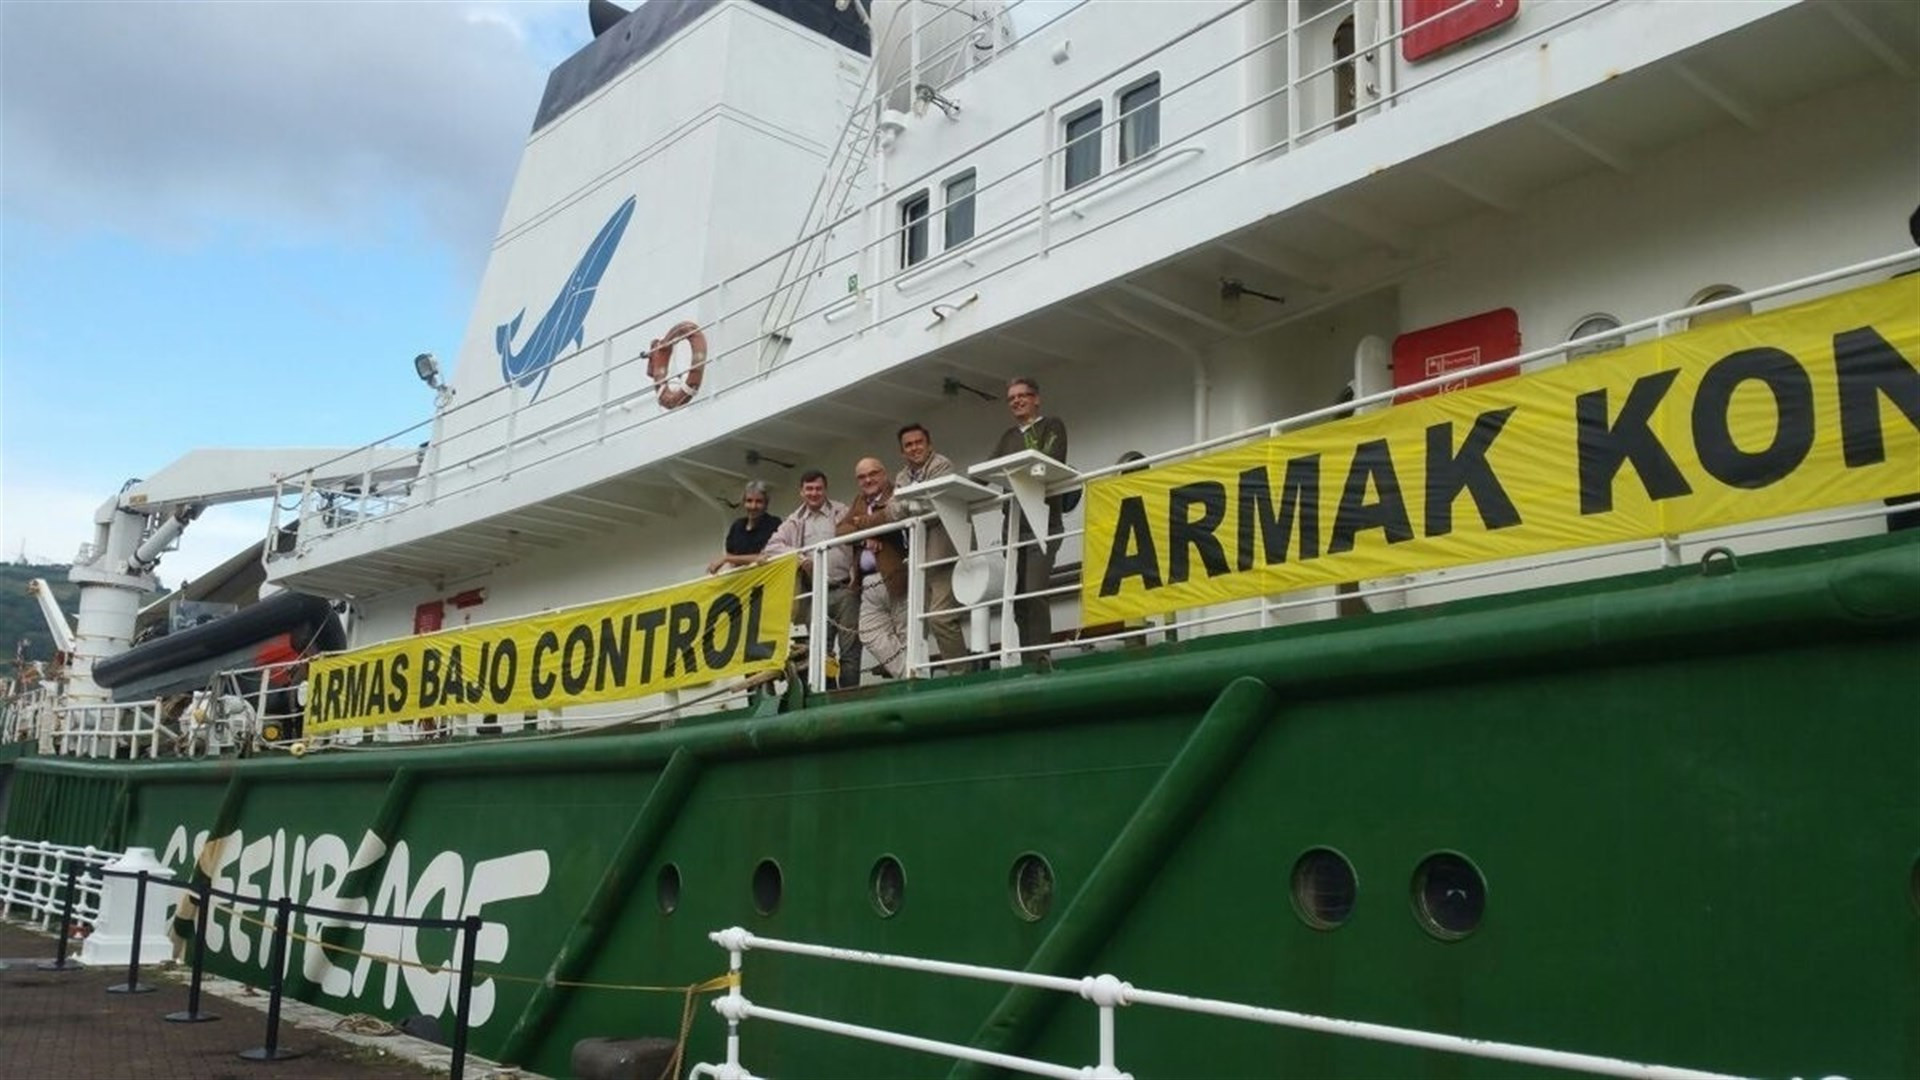 Barco Greenpeace campaa Armas bajo control